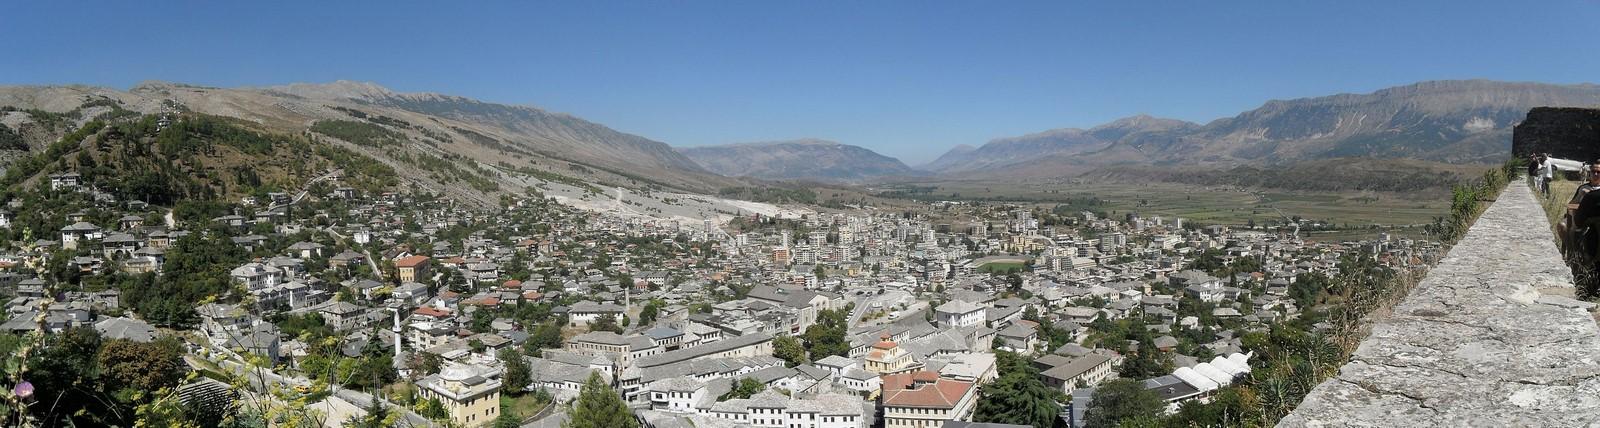 Architecture of Berat and Gjirokastra - Sheet3